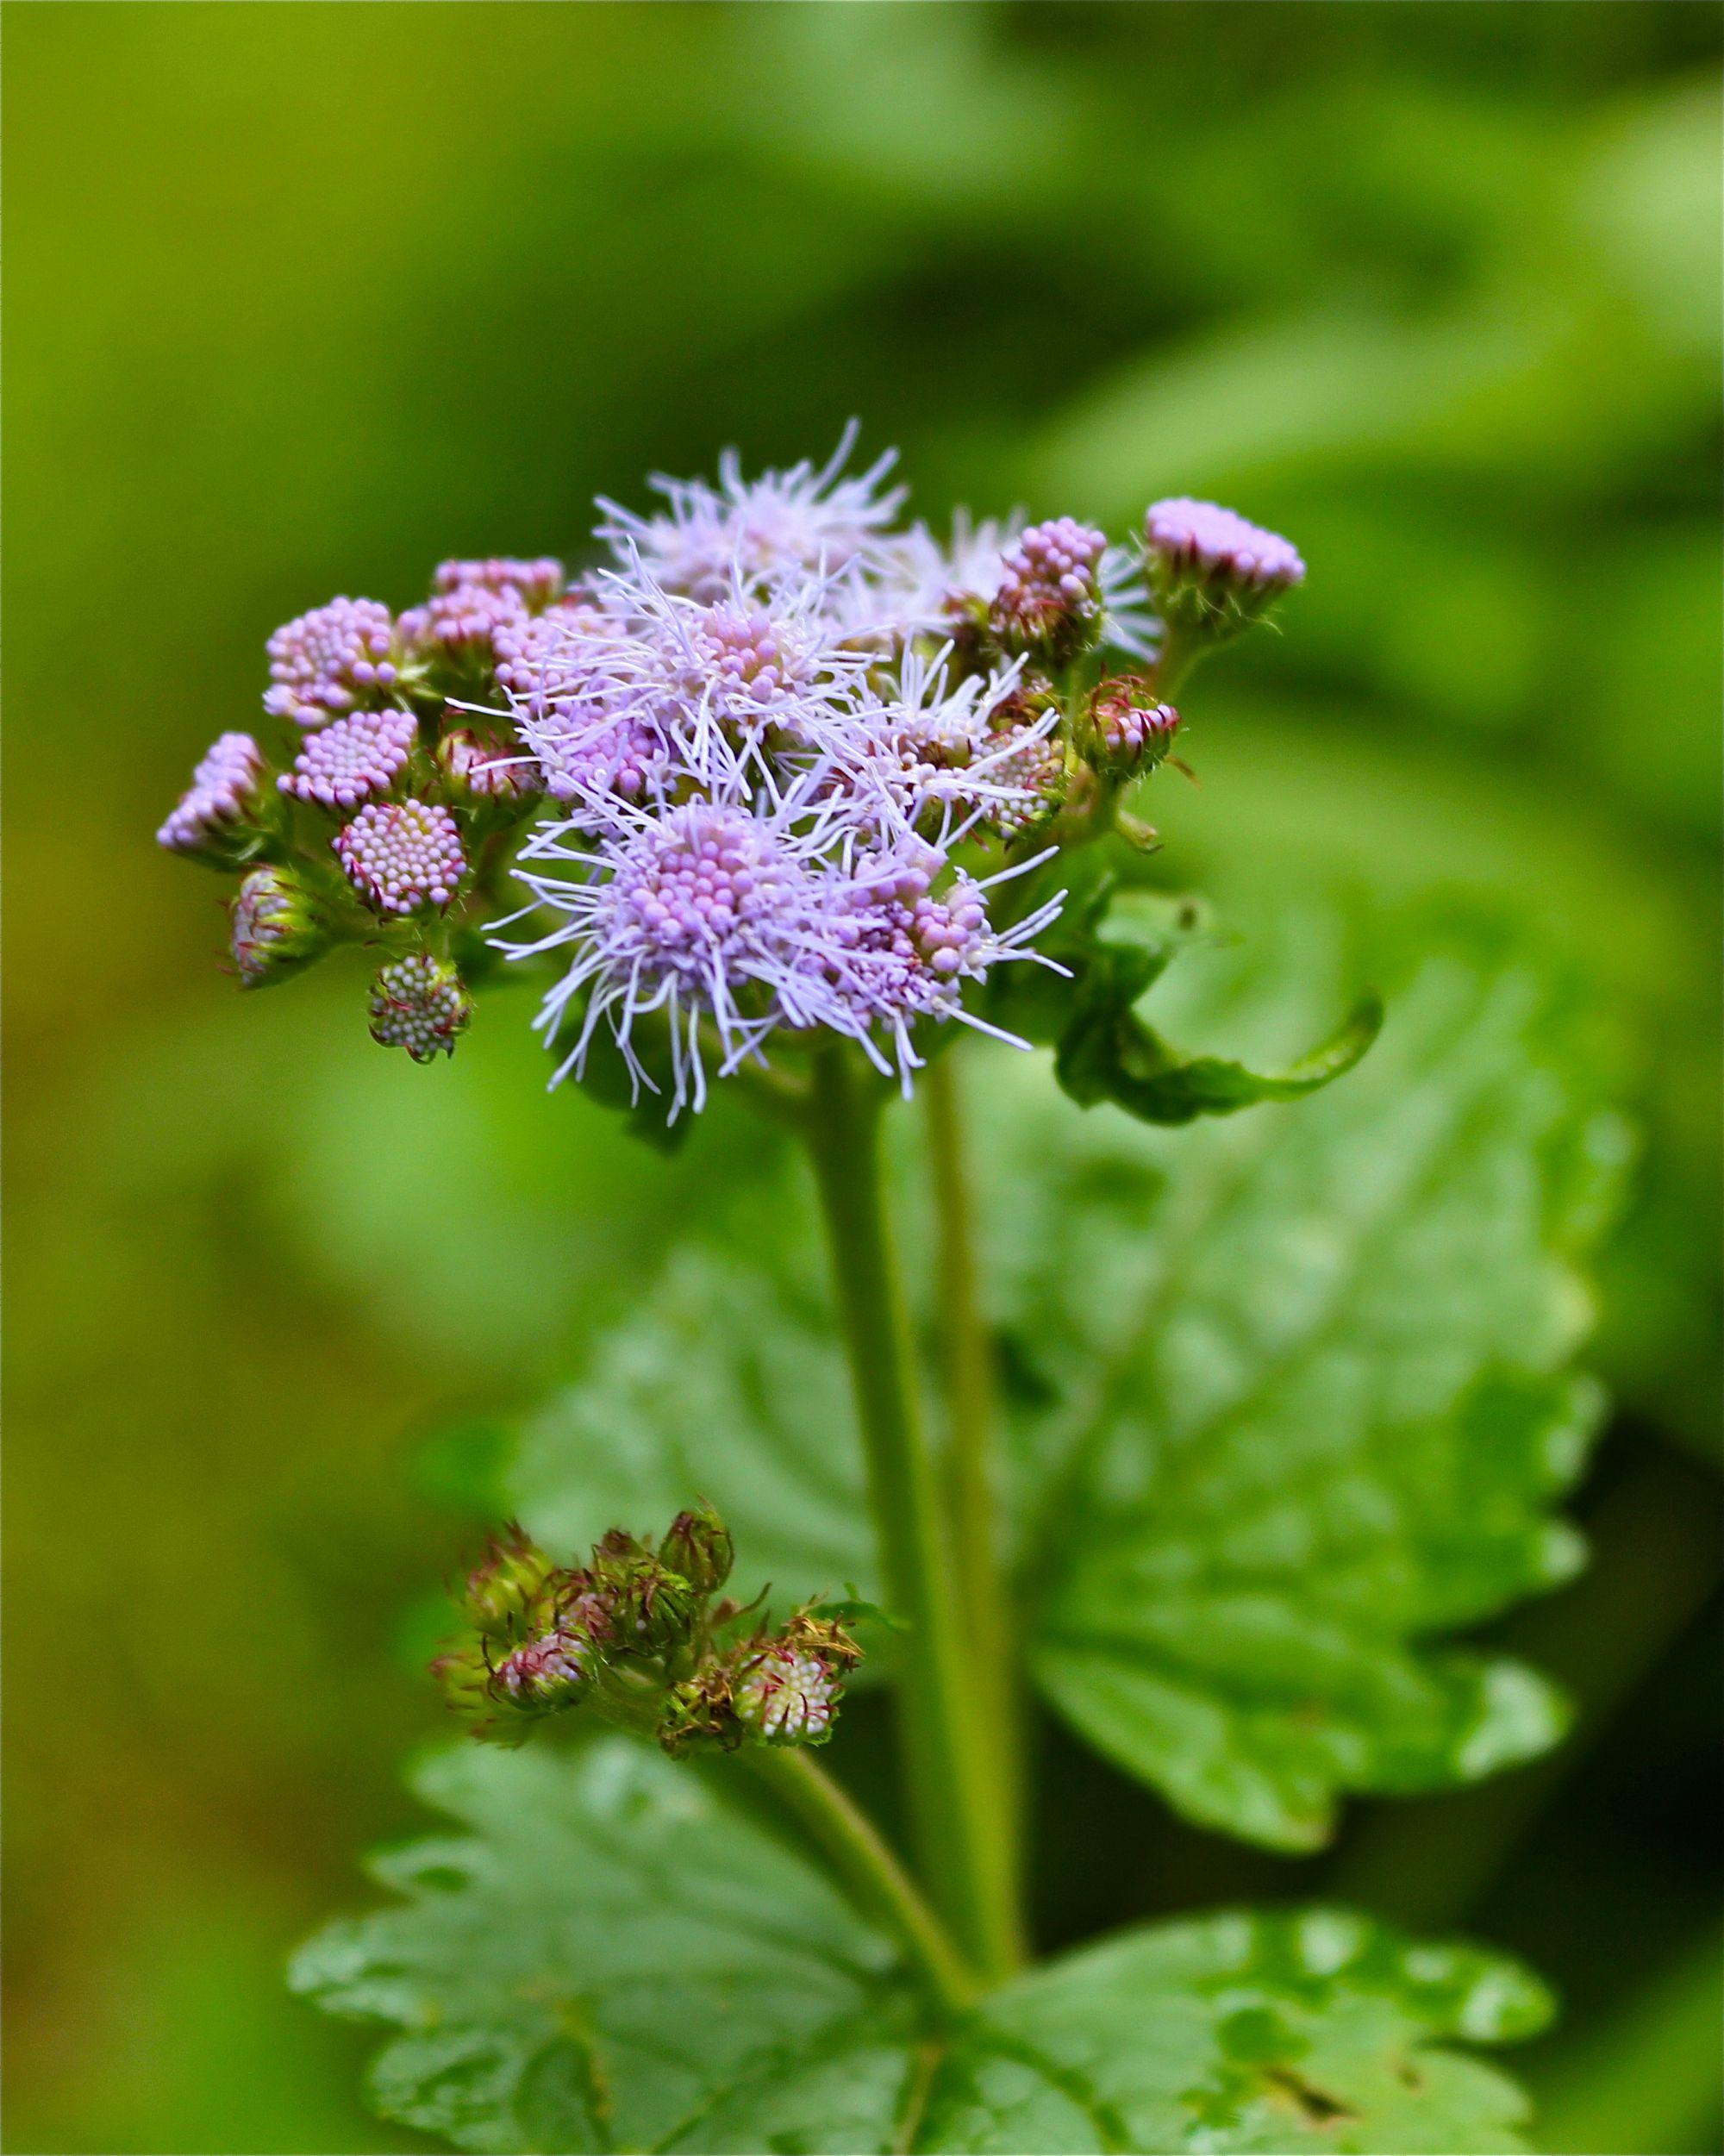 Blue Mist Flower Or Wild Ageratum Virginia Wildflowers In 2020 Wild Flowers Growing Gardens Plants